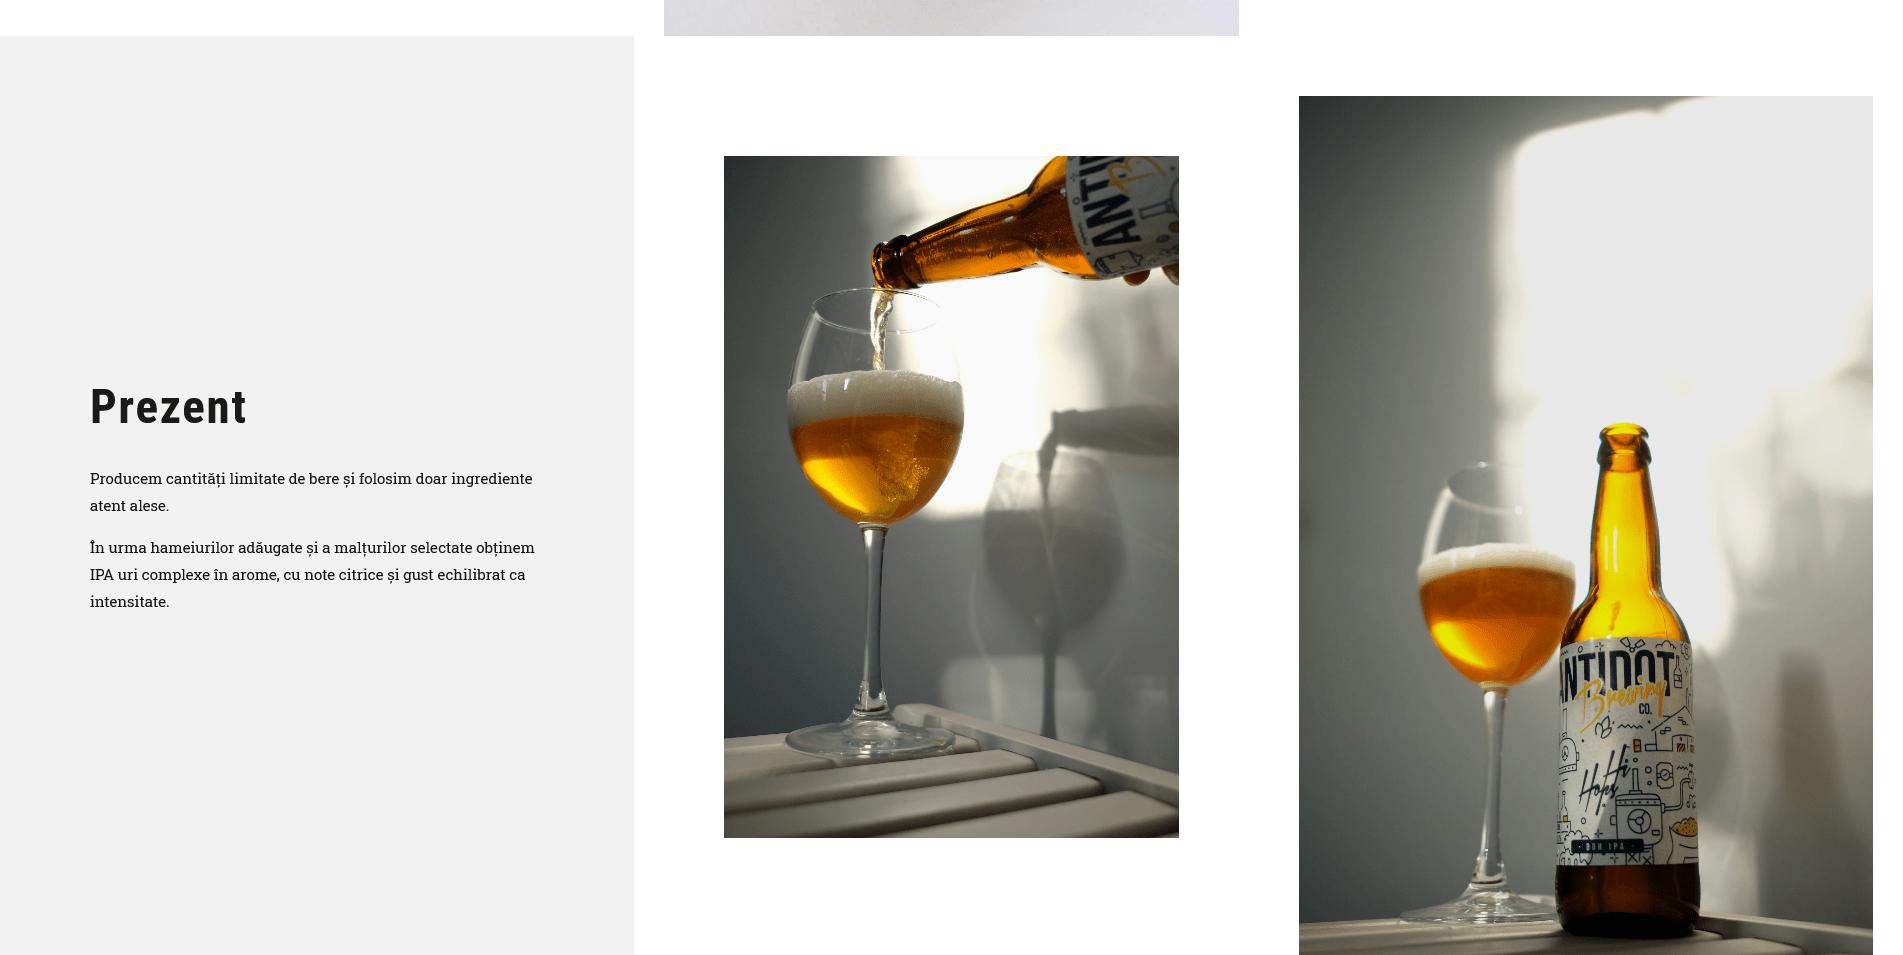 Antidot – Brewing 4